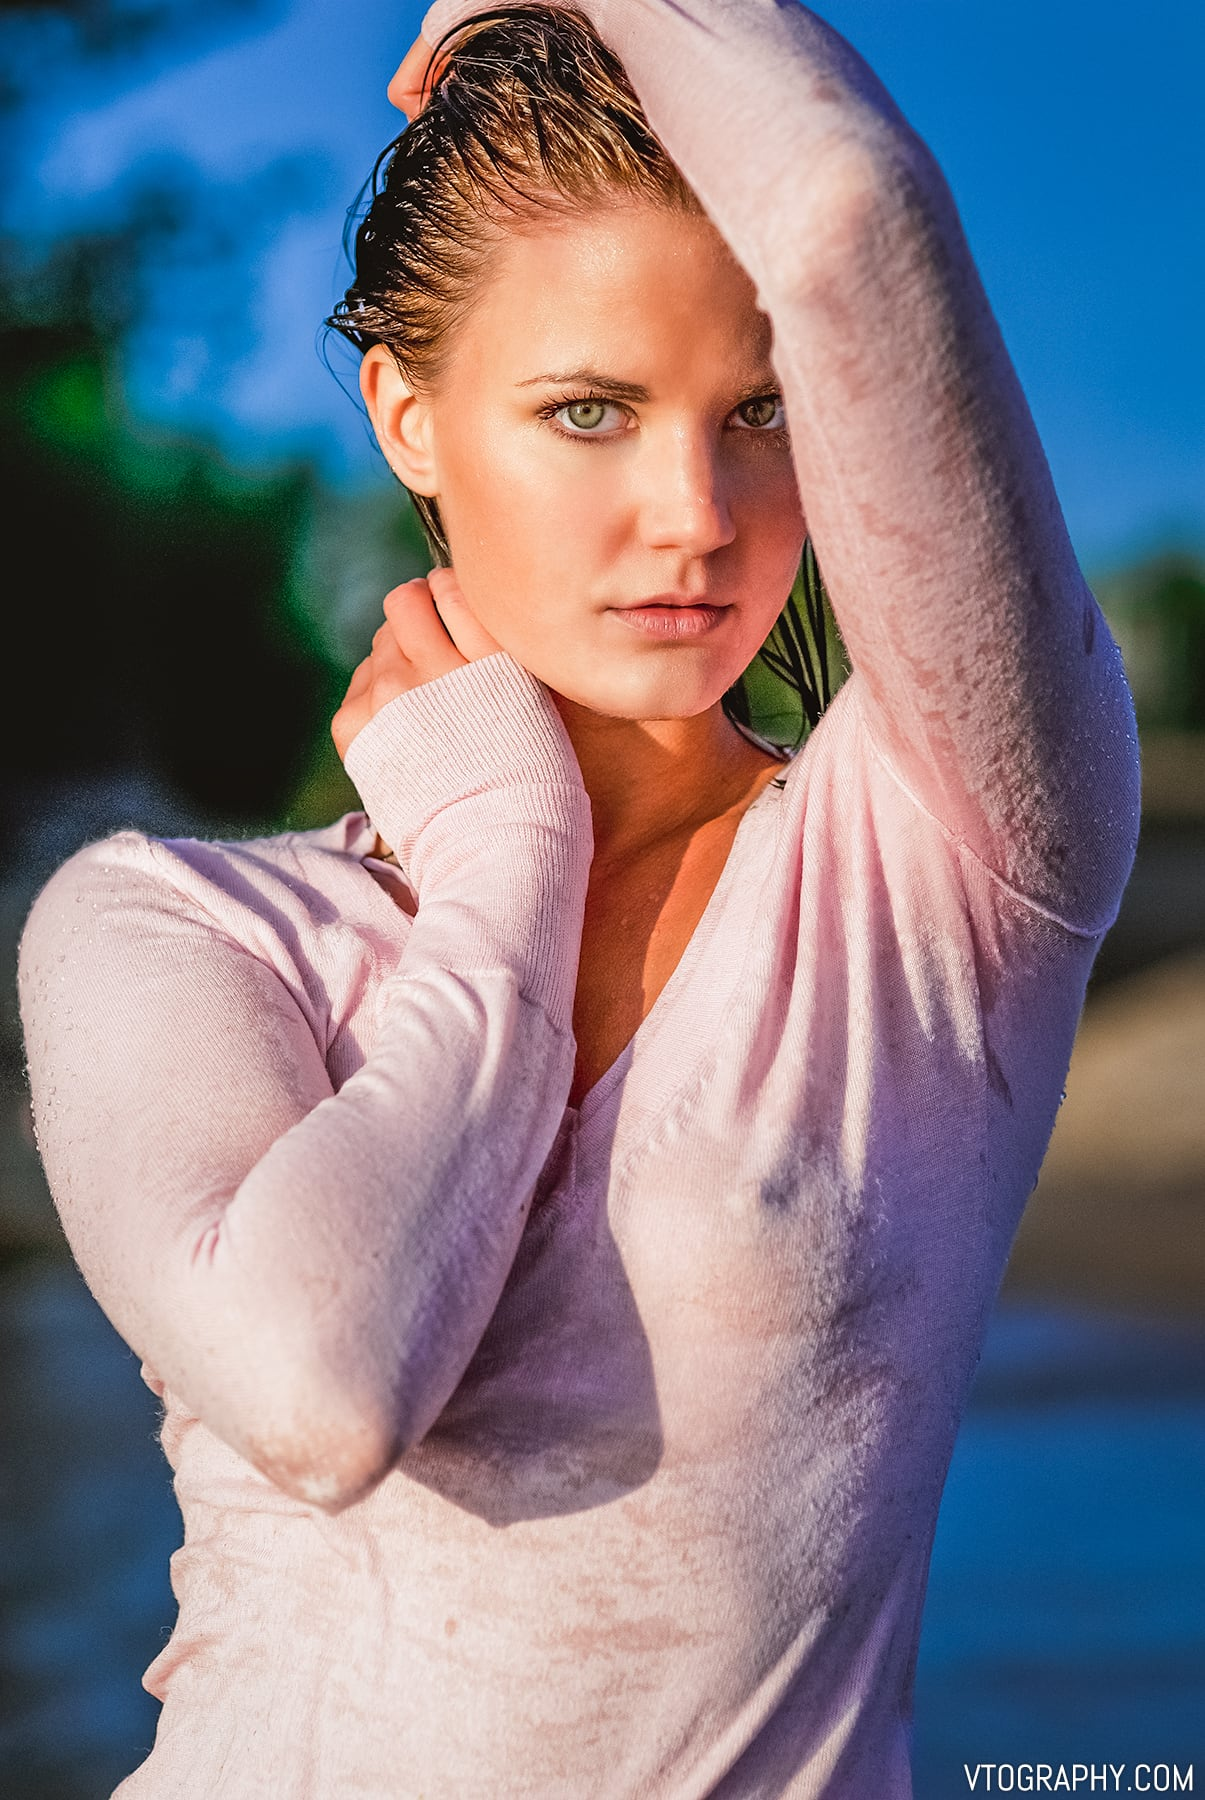 Sunrise photo shoot with model Randall